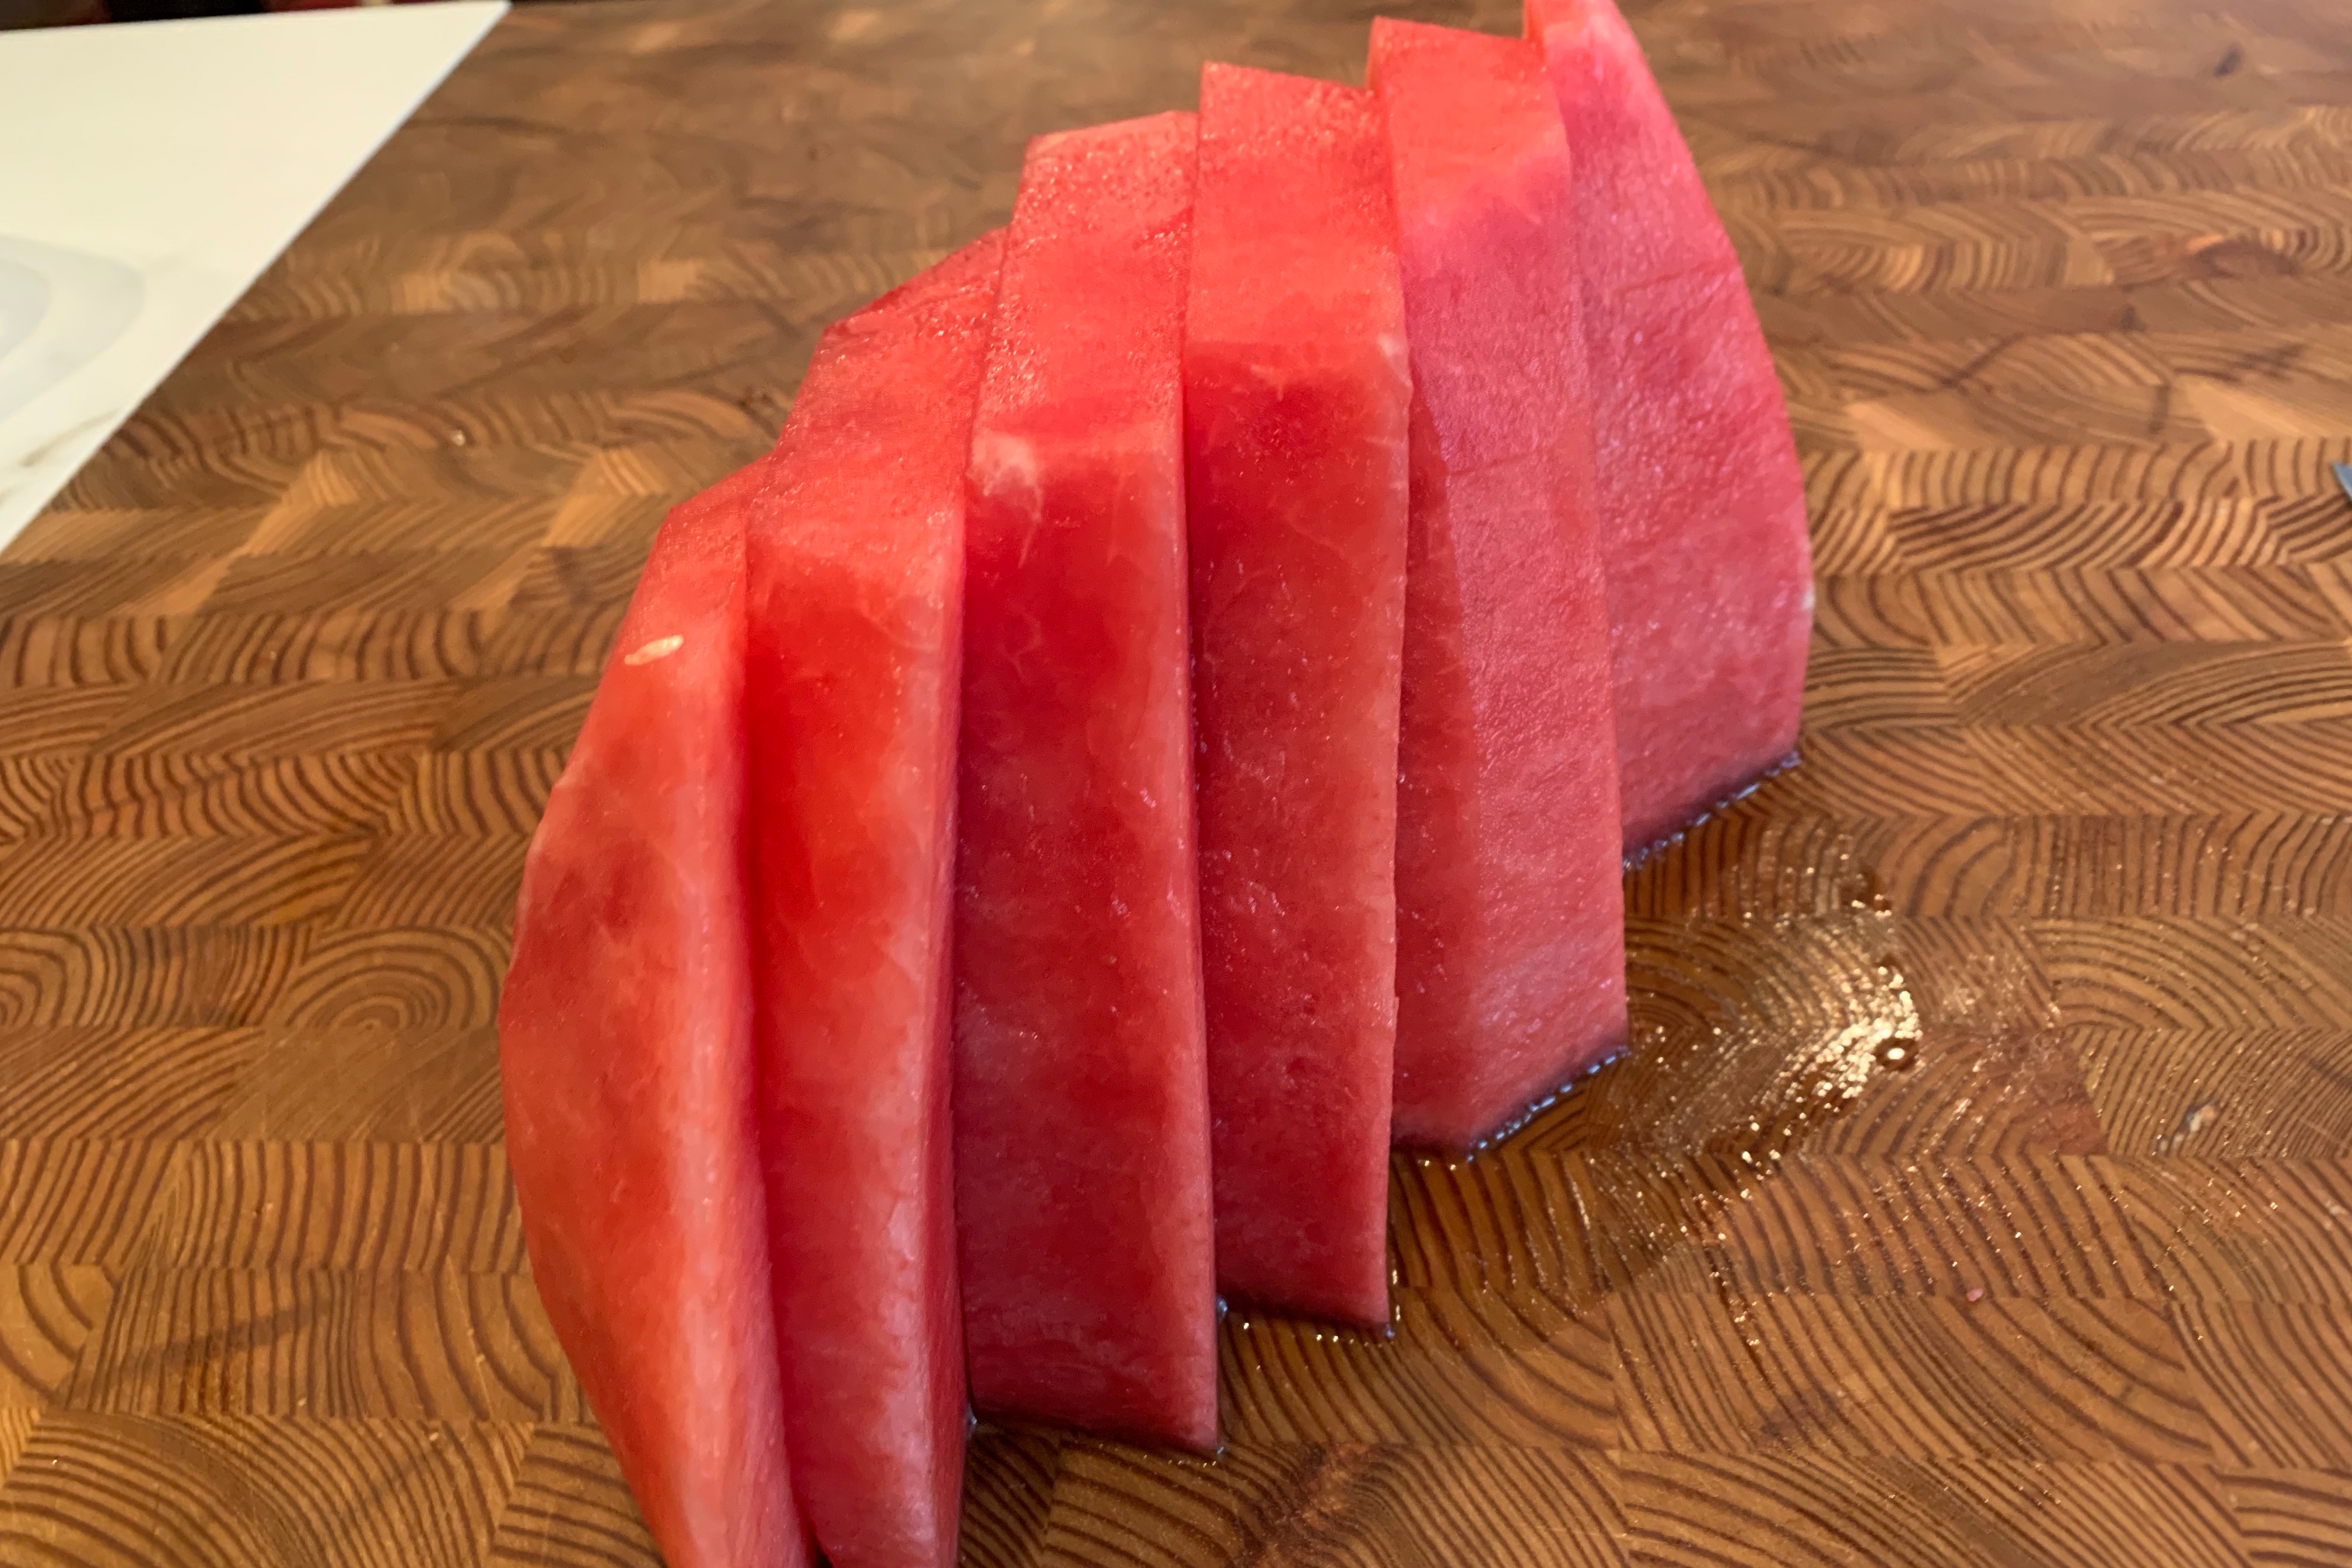 sliced-no-peel